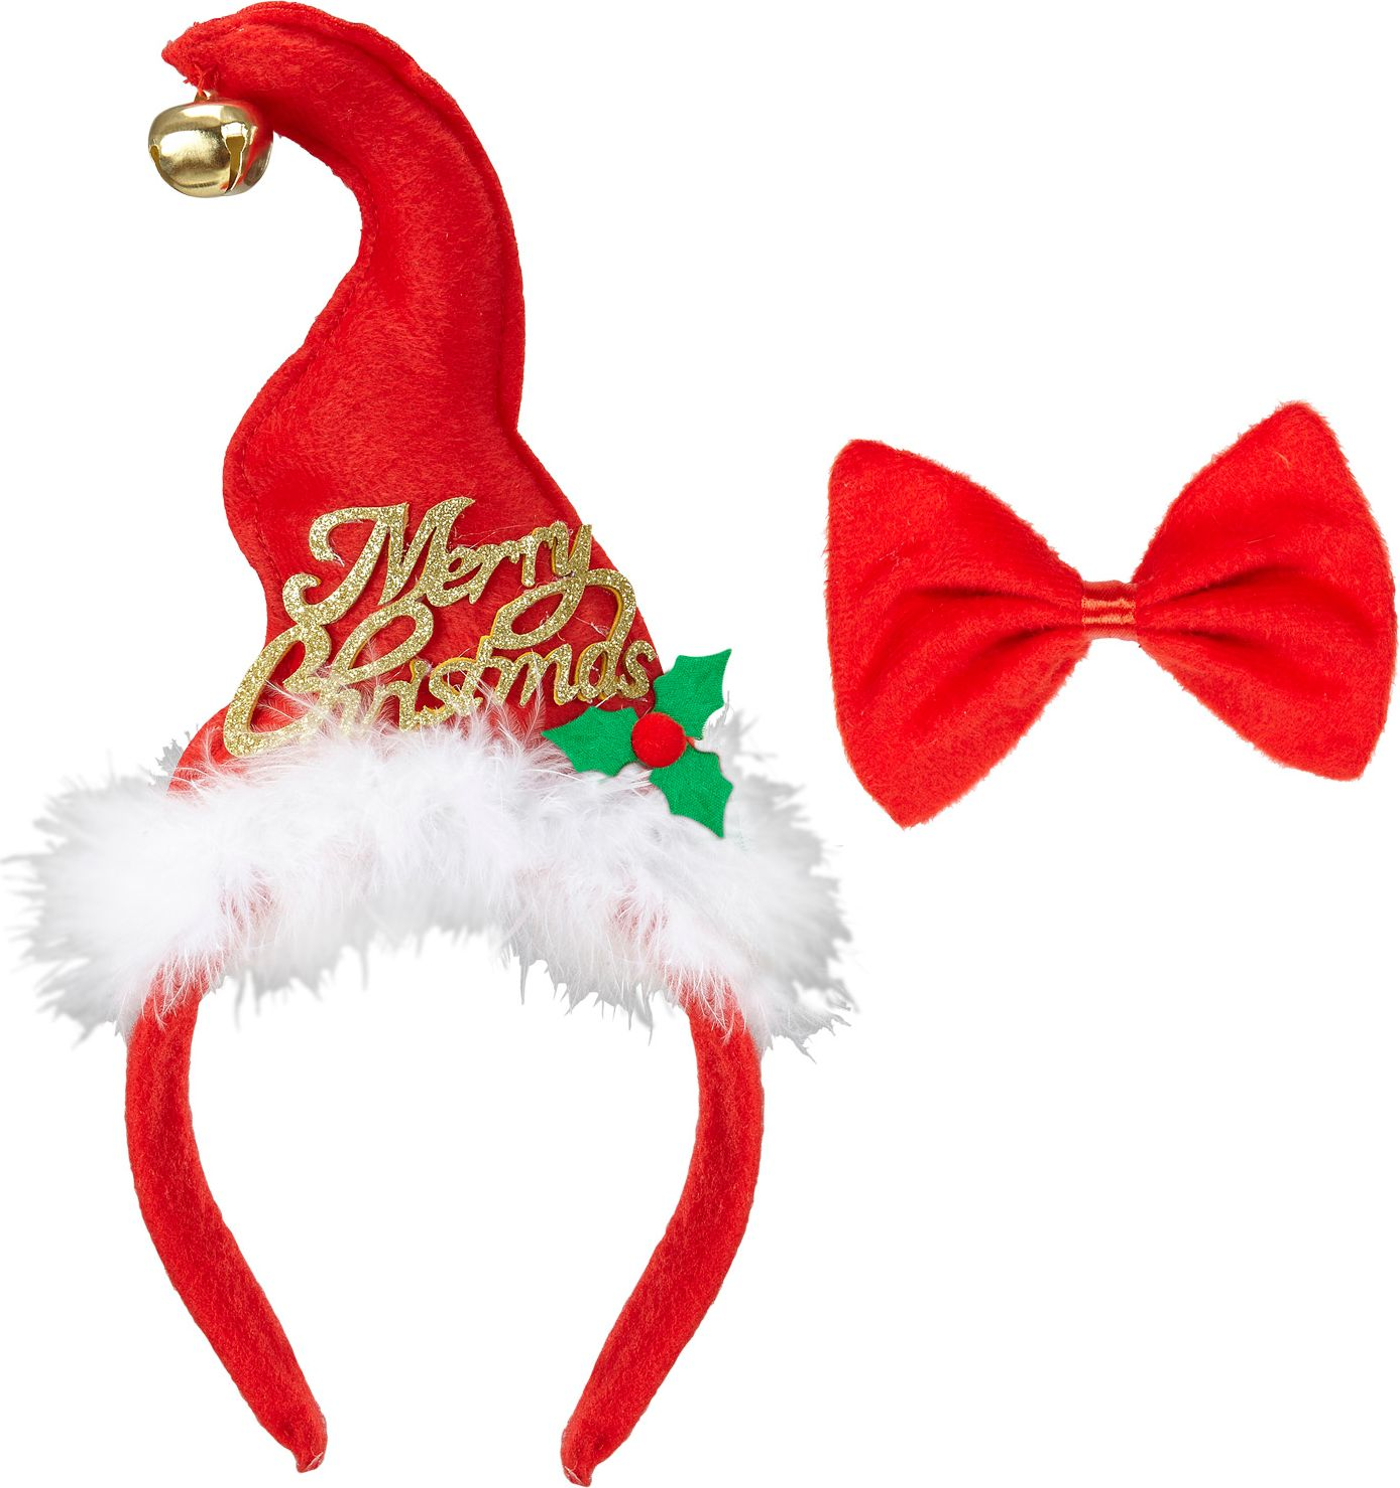 Kerstmuts met strikje